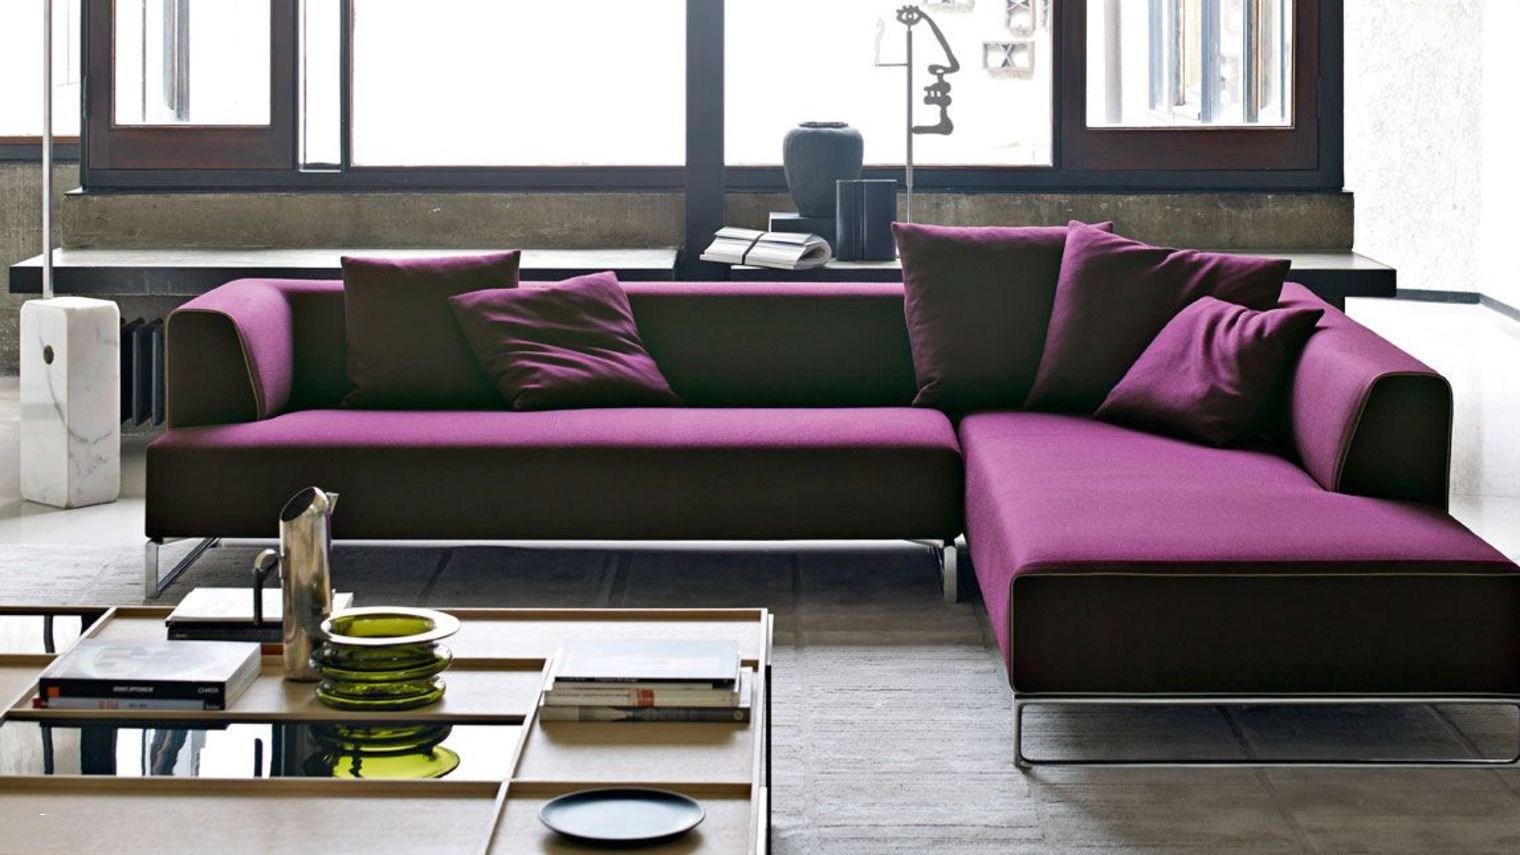 Housse Canapé Angle Conforama Luxe Galerie 27 Incroyable Canapé Design Design De Maison